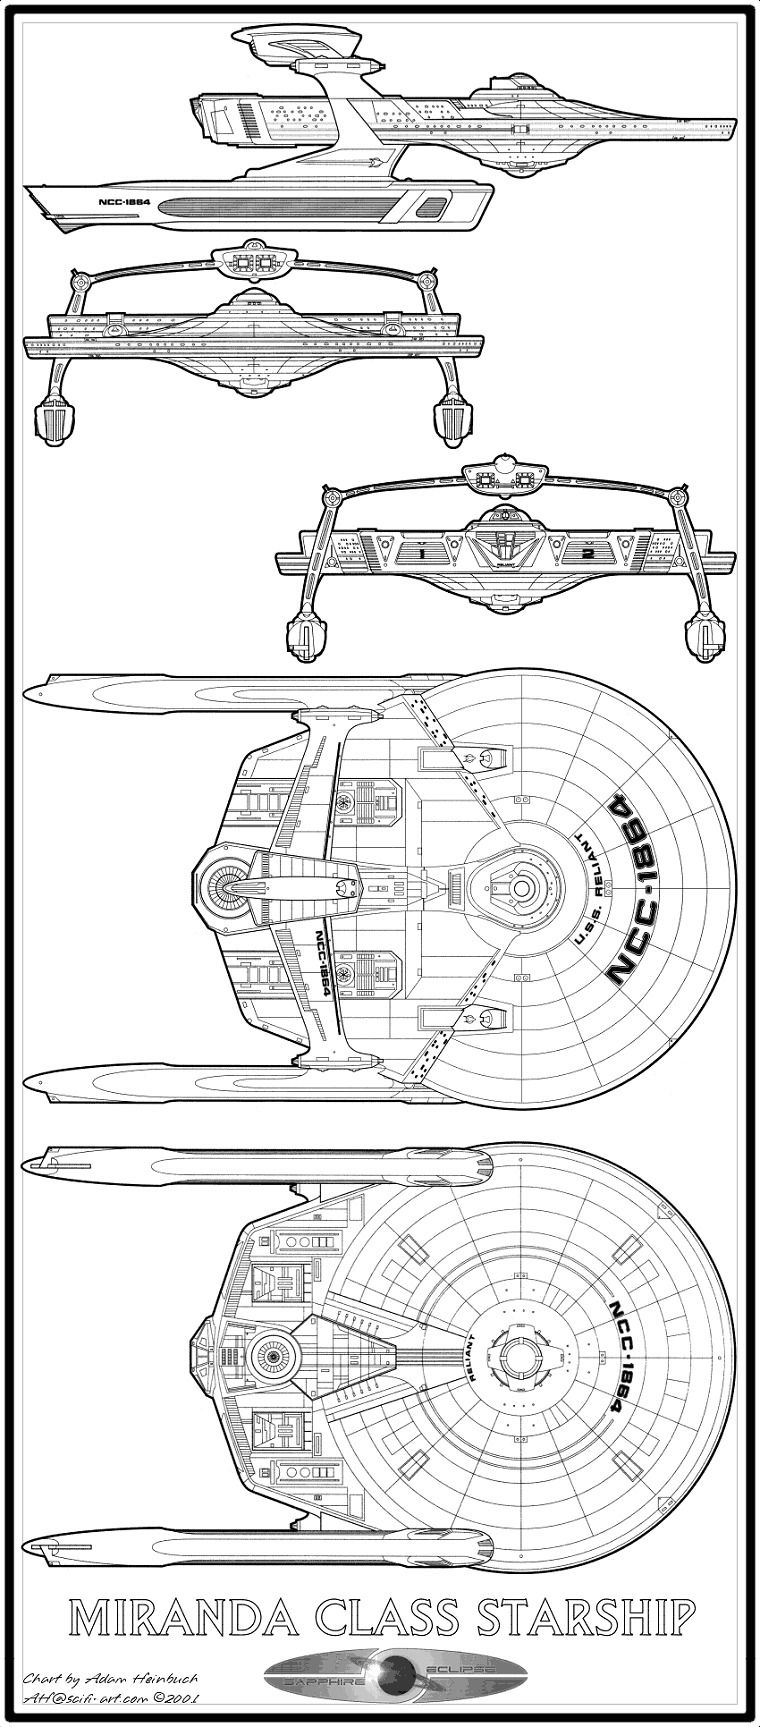 Miranda-cl starship schematics | *Nerd Alert*!!! | Pinterest ... on macross sdf-1 schematics, train schematics, cylon fighter schematics, space schematics, starbase schematics, mecha schematics,